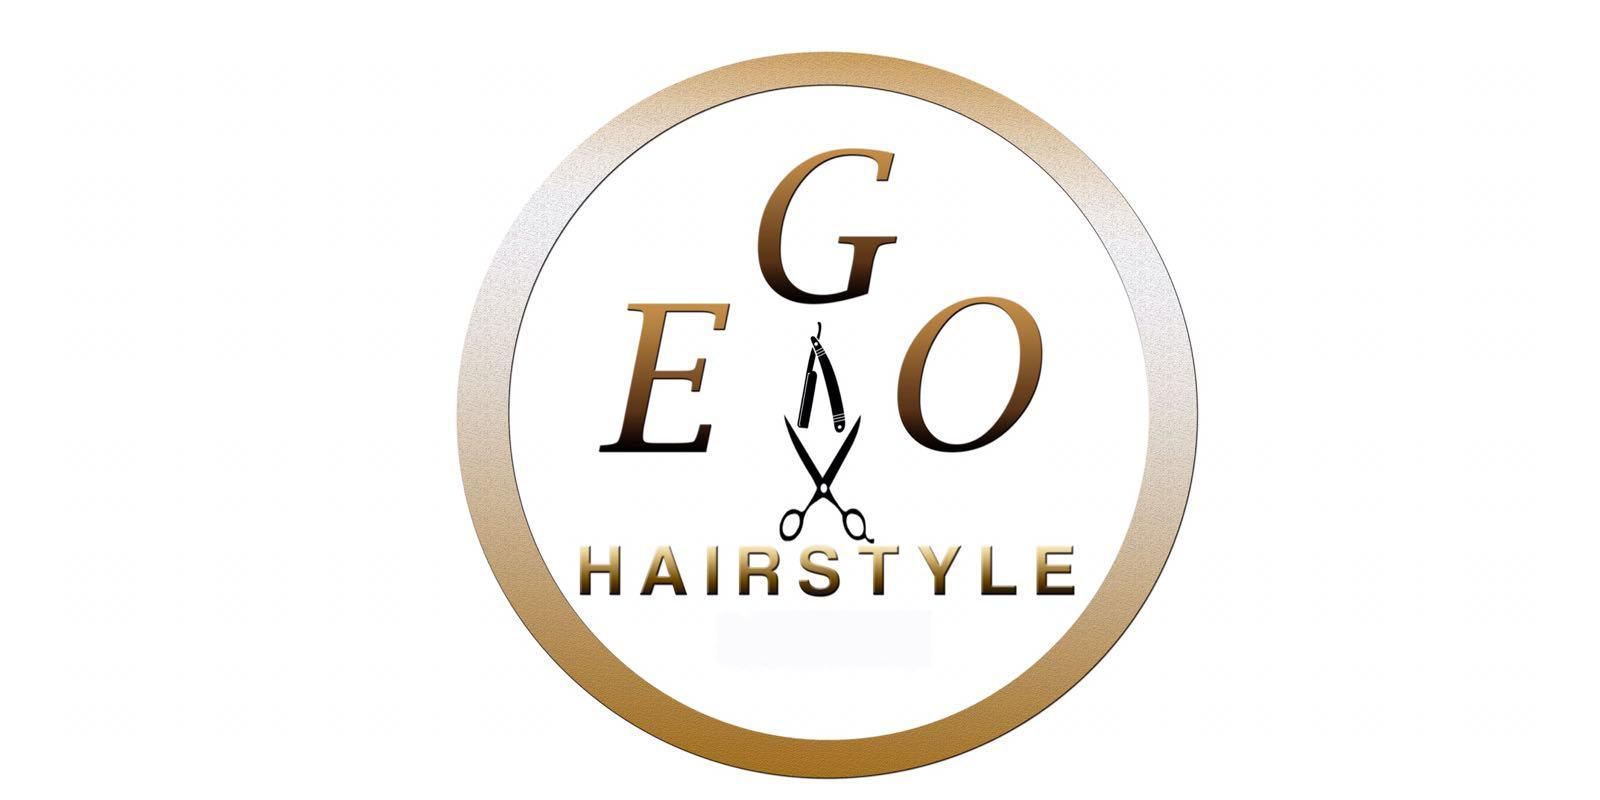 Ego Hairstyle